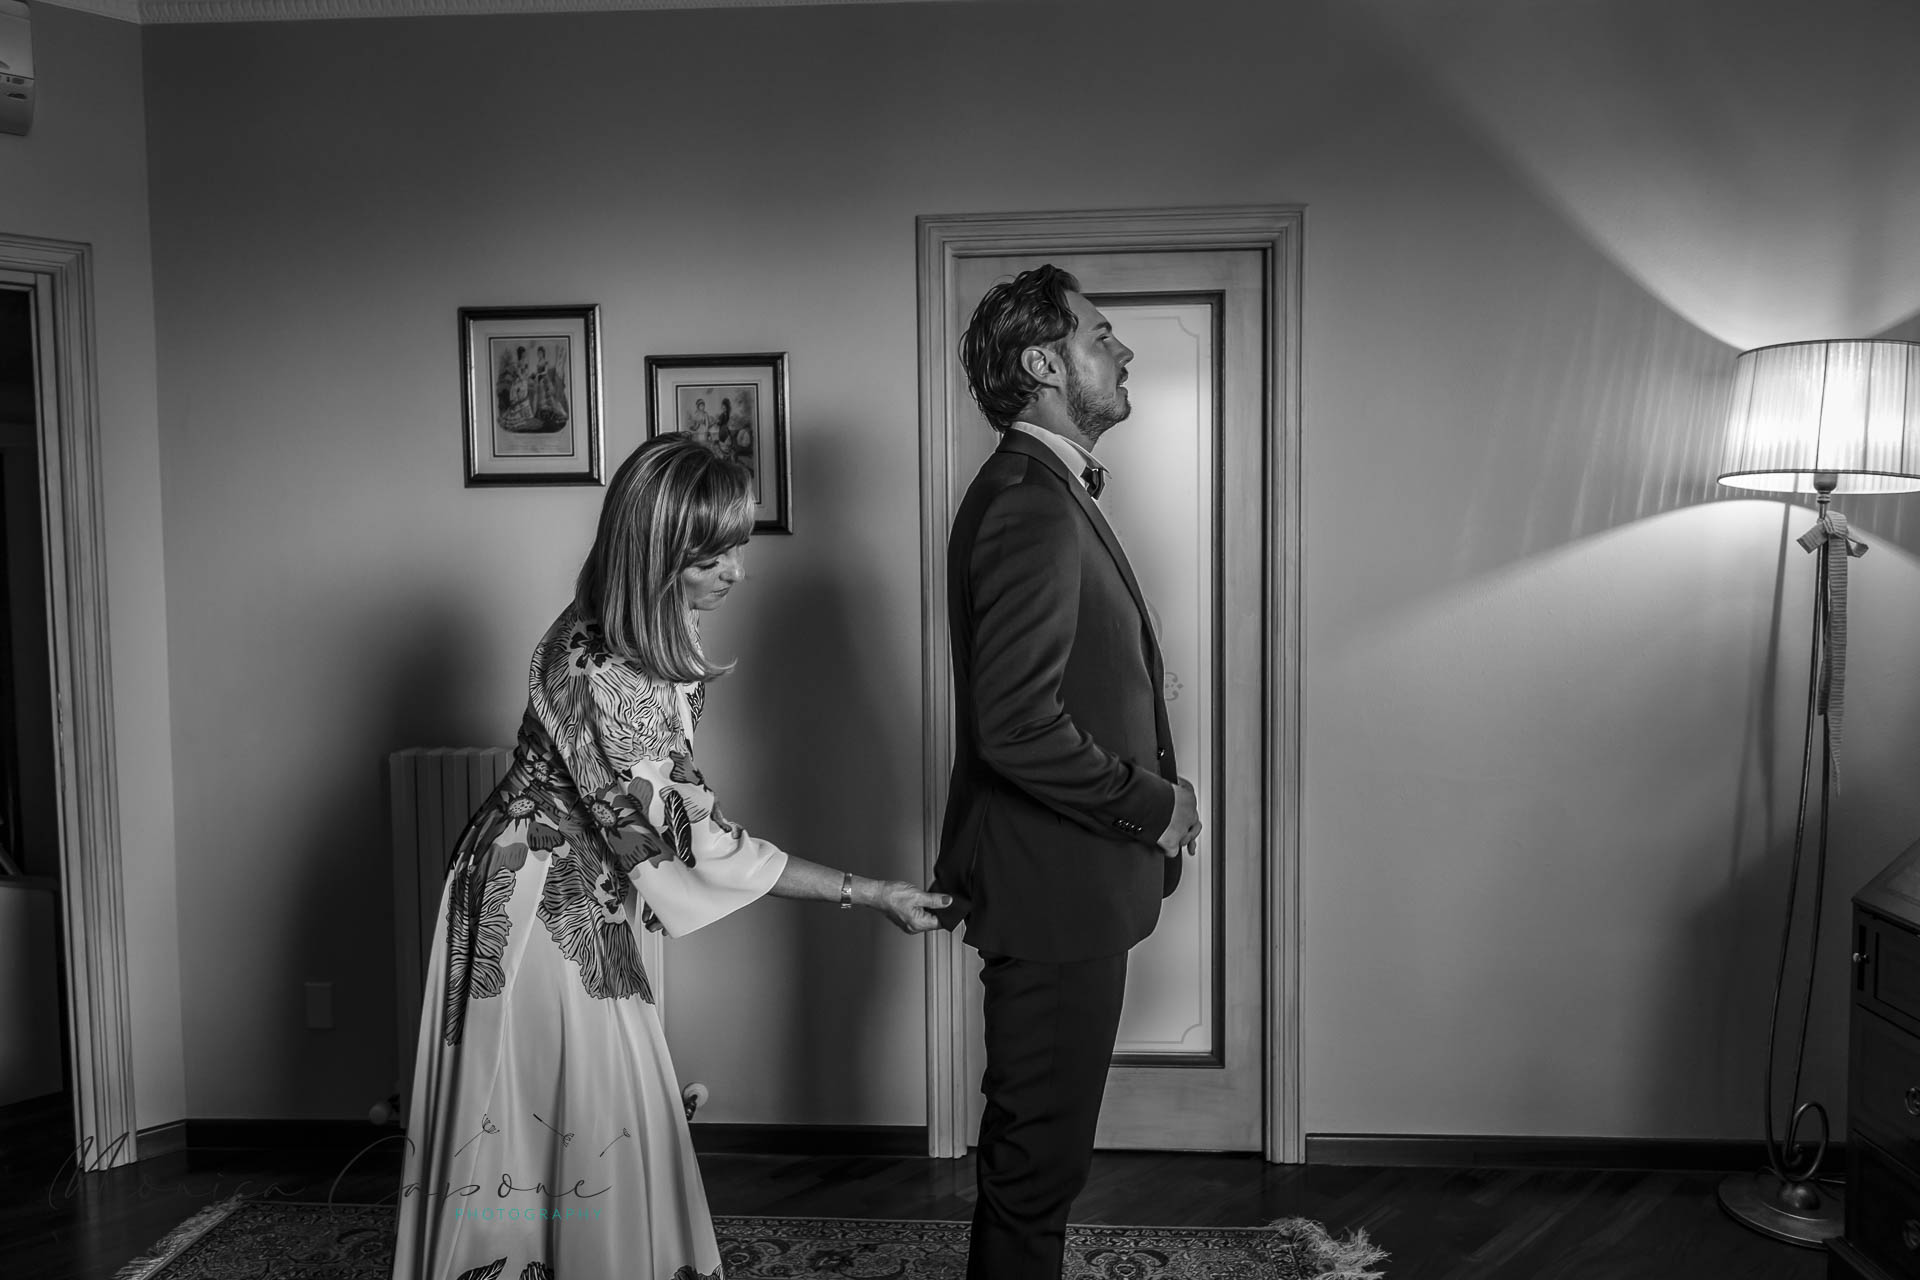 miglior-fotografo-matrimonio